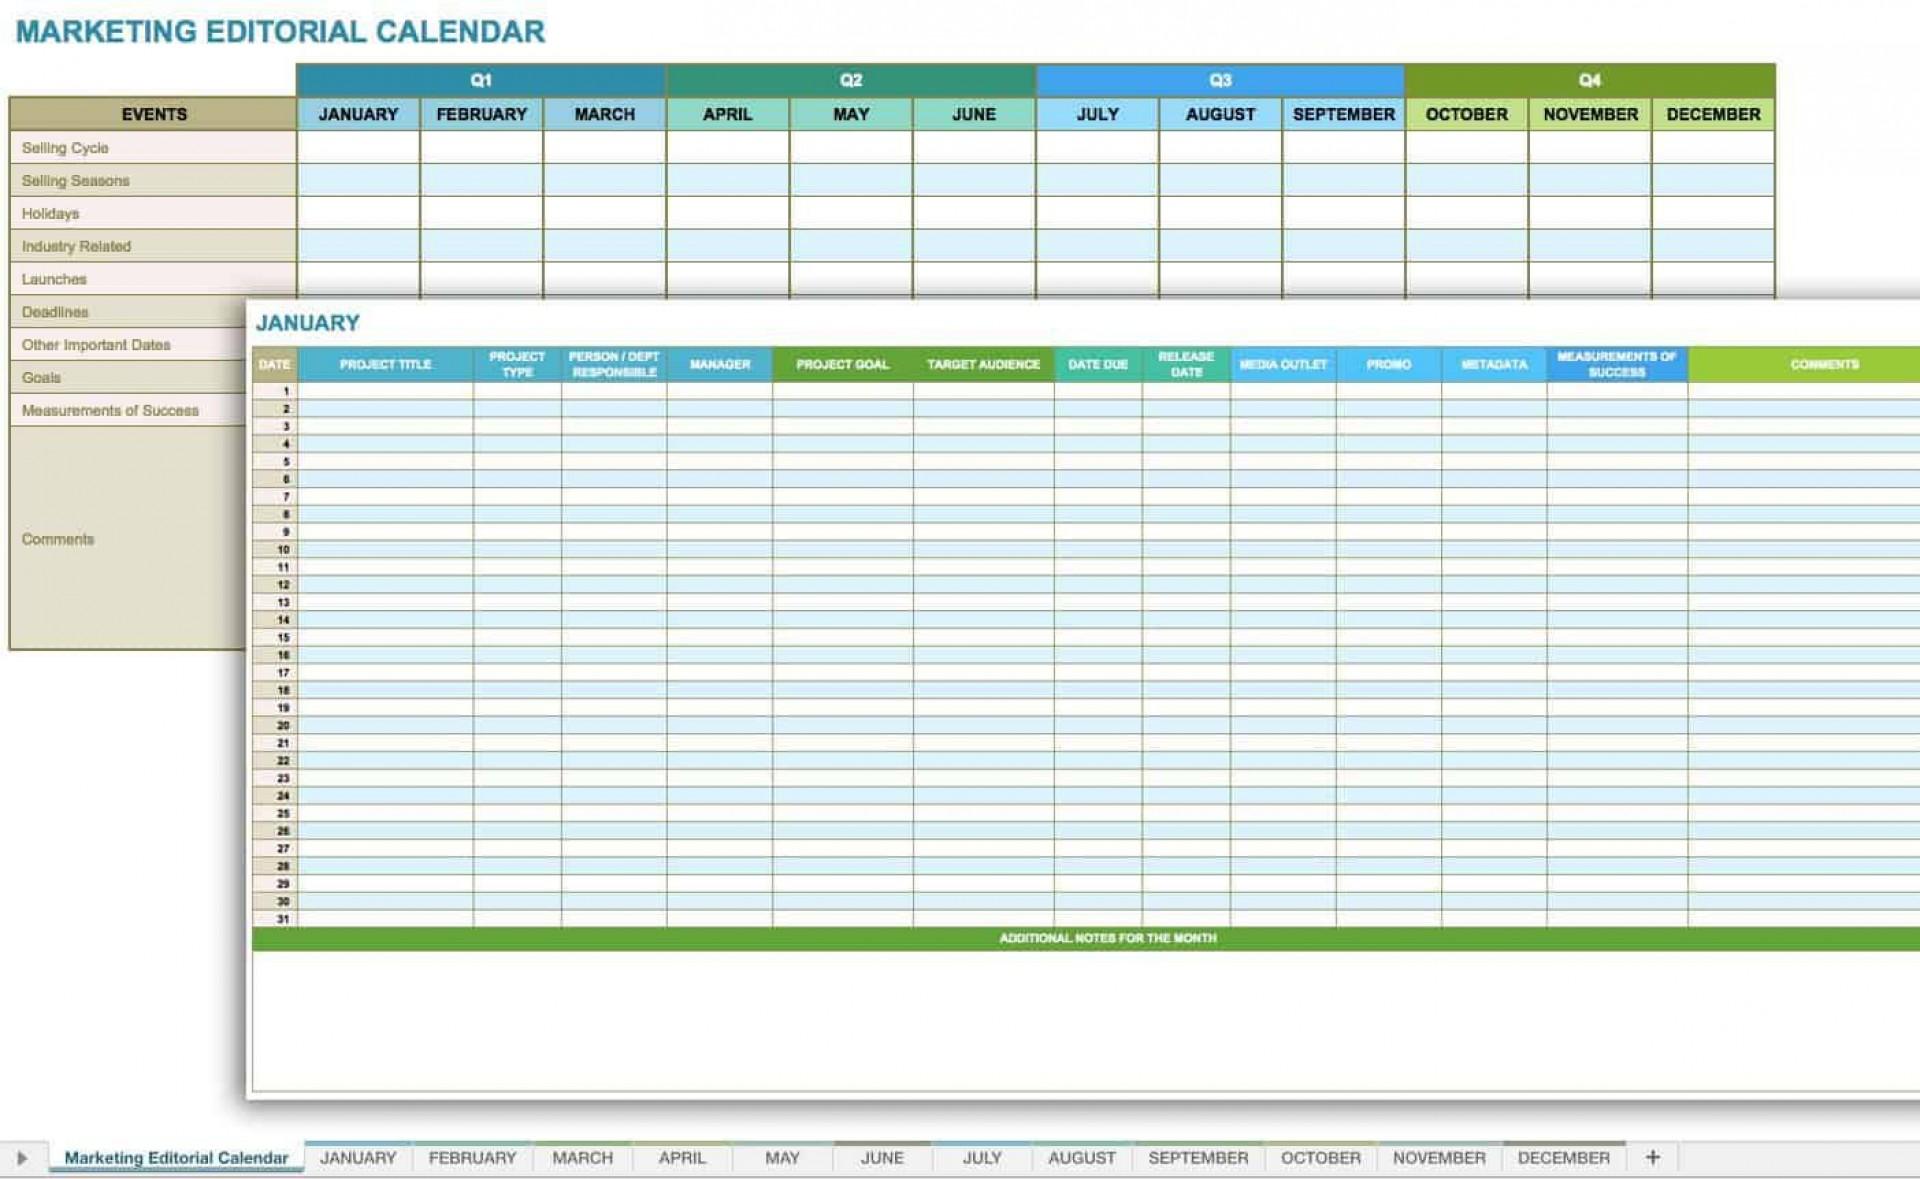 005 Exceptional Social Media Editorial Calendar Template High Def  Content Excel 2020 Free Download1920